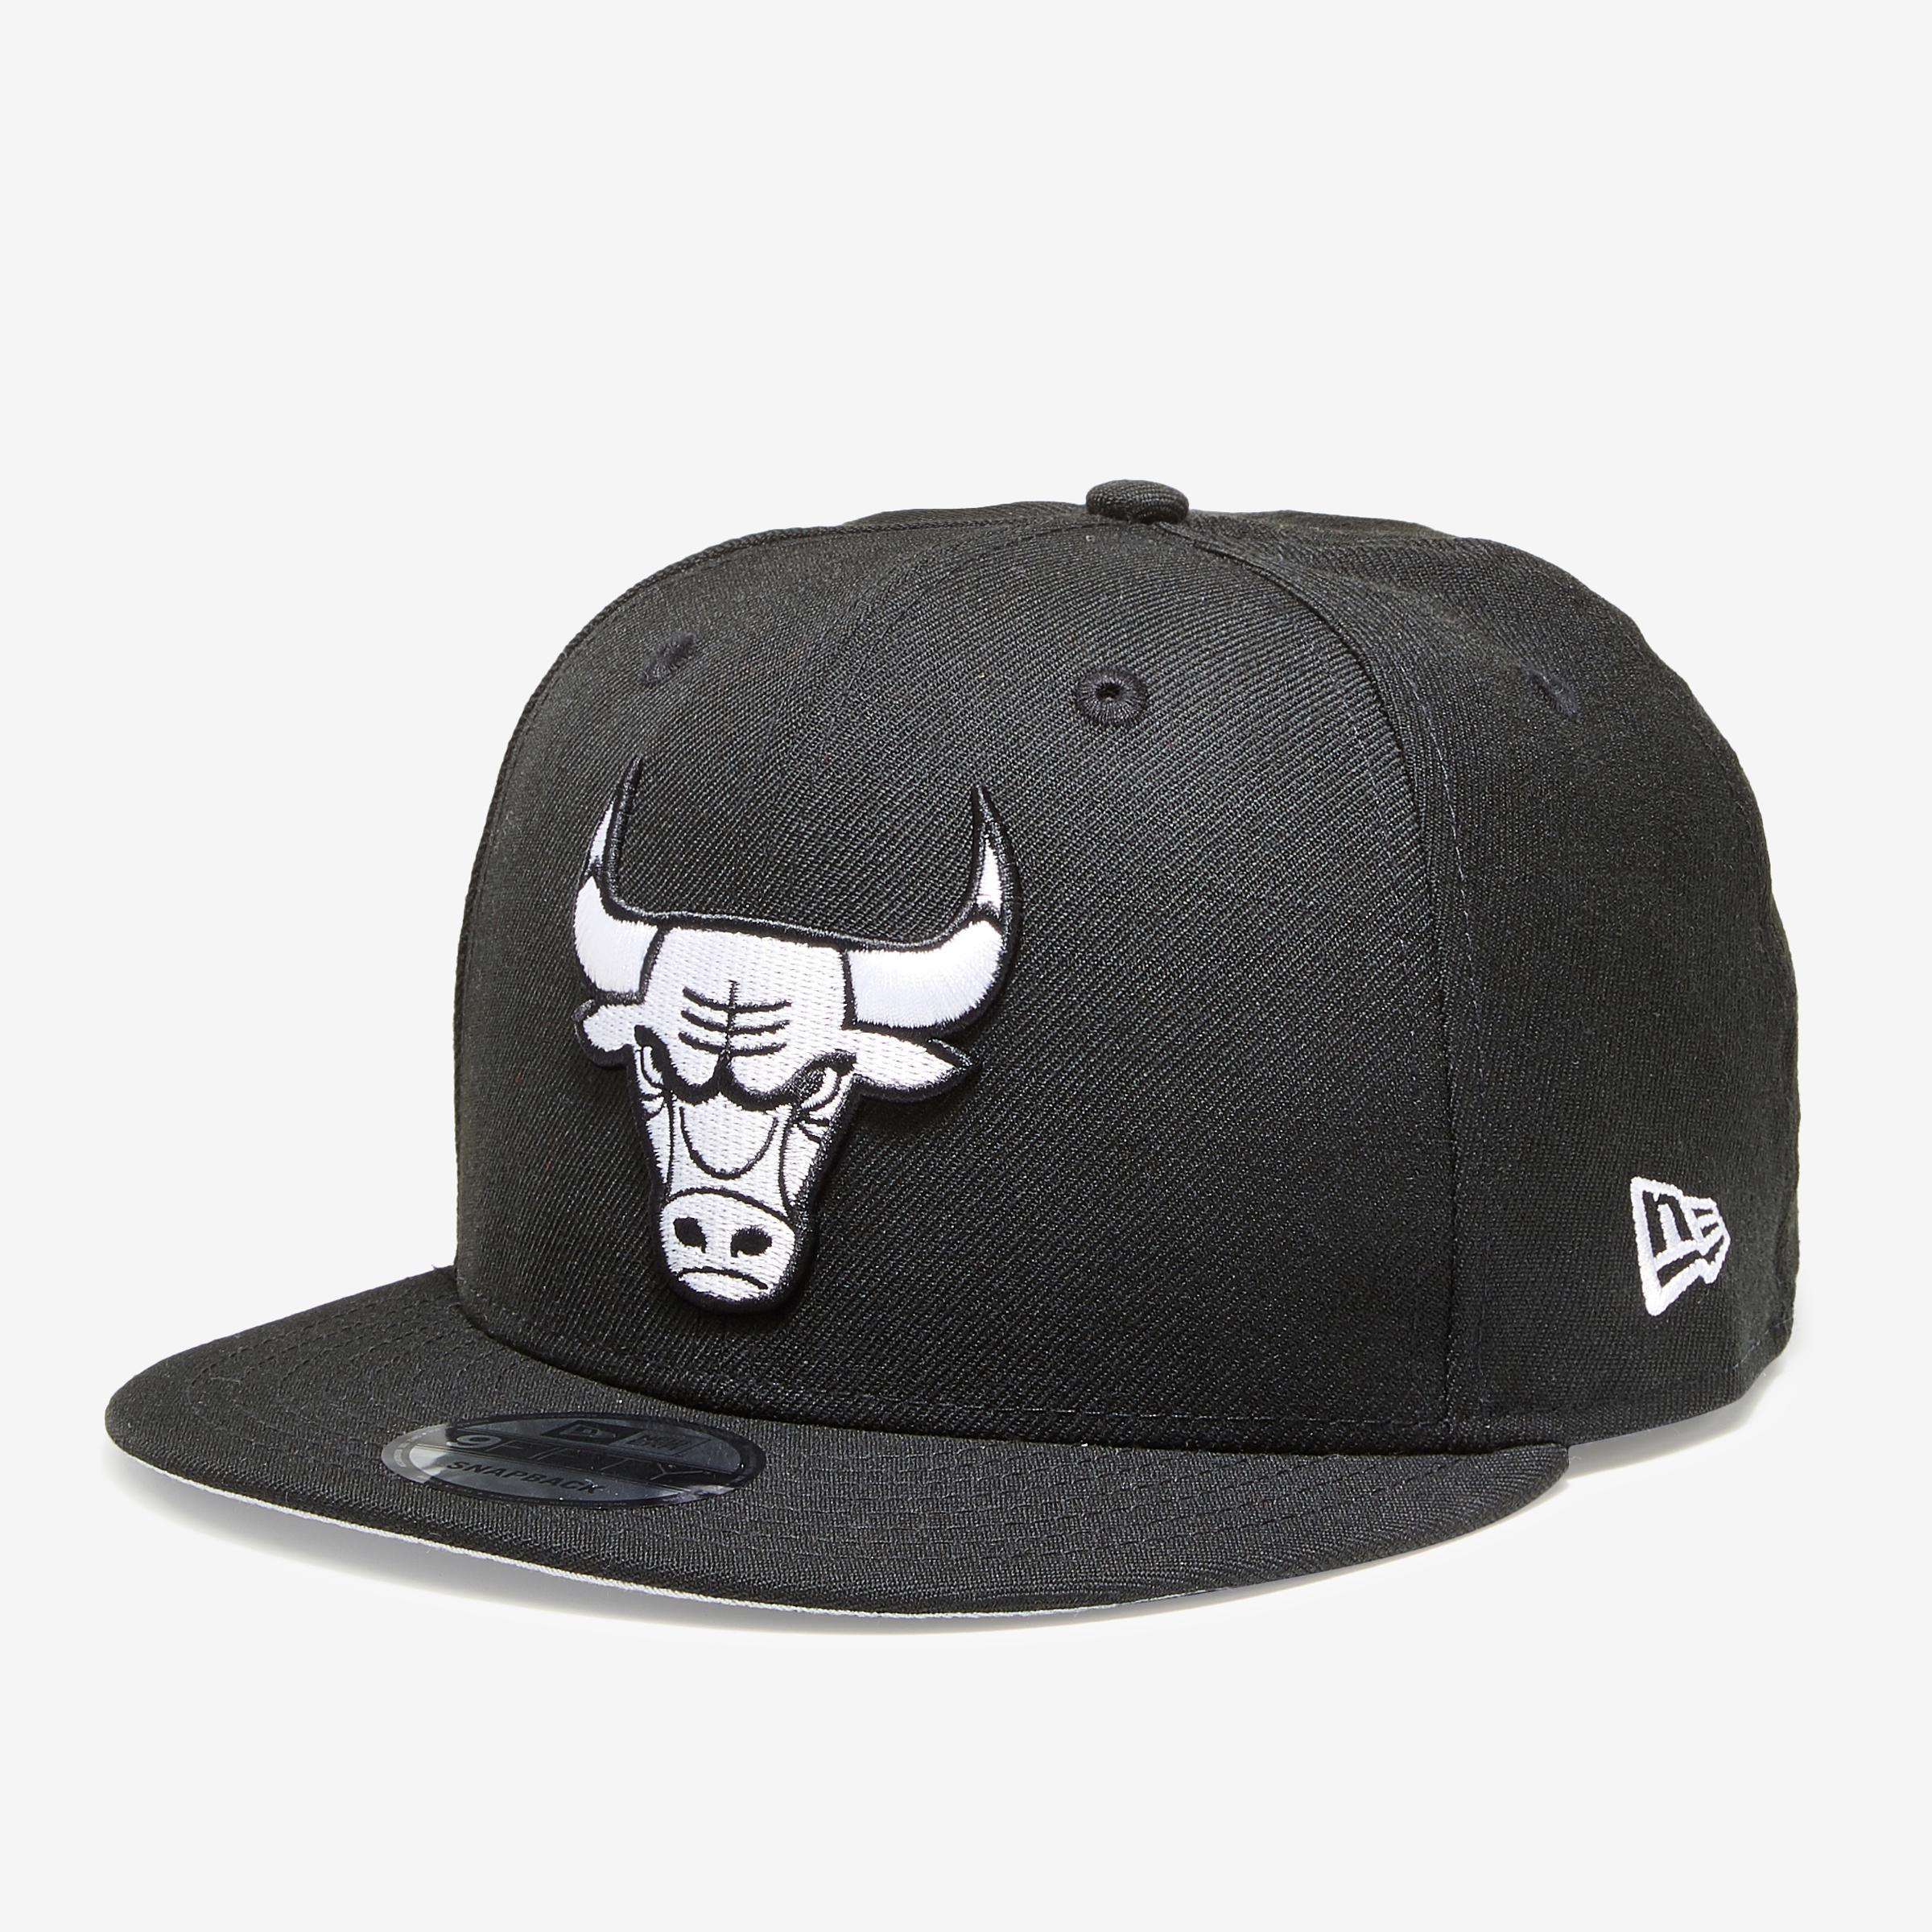 Bulls 9fifty Snapback